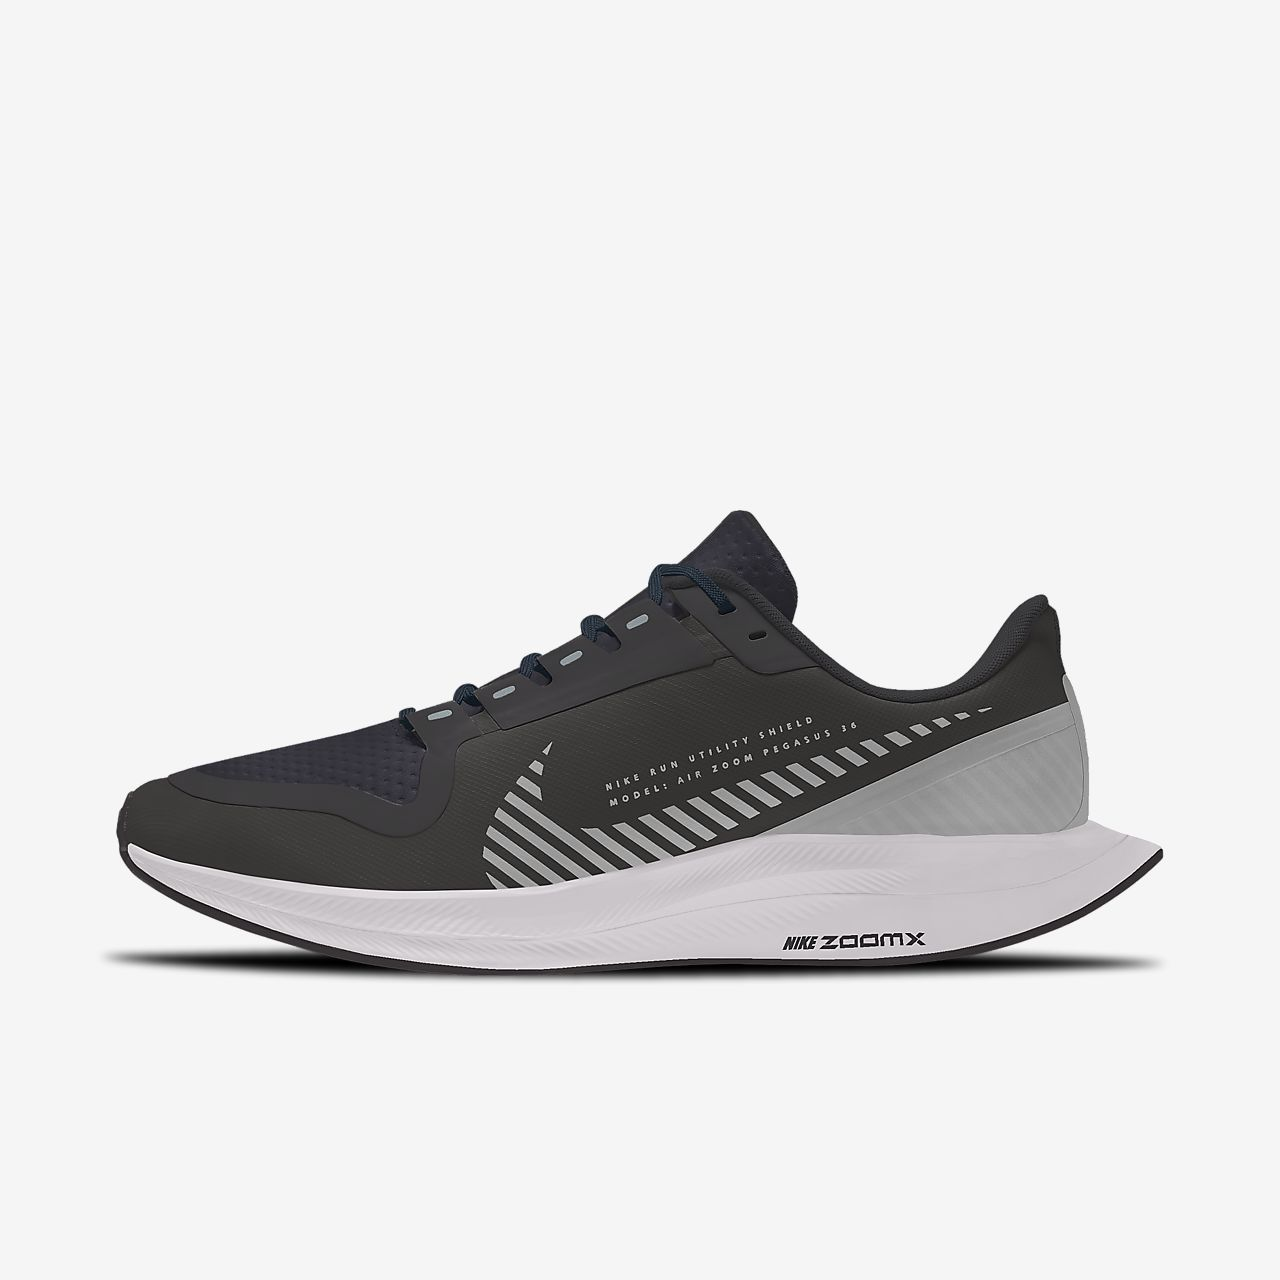 Nike Zoom Pegasus Turbo 2 Shield Low By You Zapatillas de running personalizables - Mujer